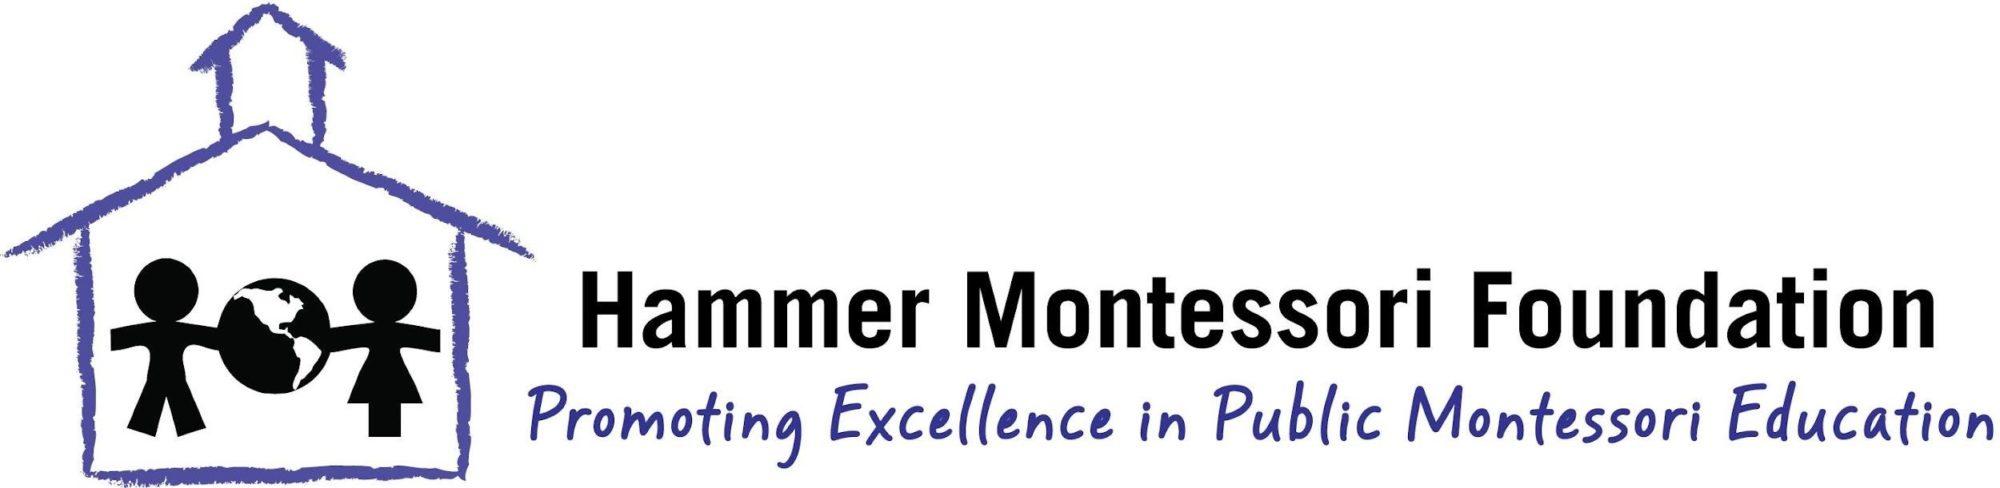 Hammer Montessori Foundation